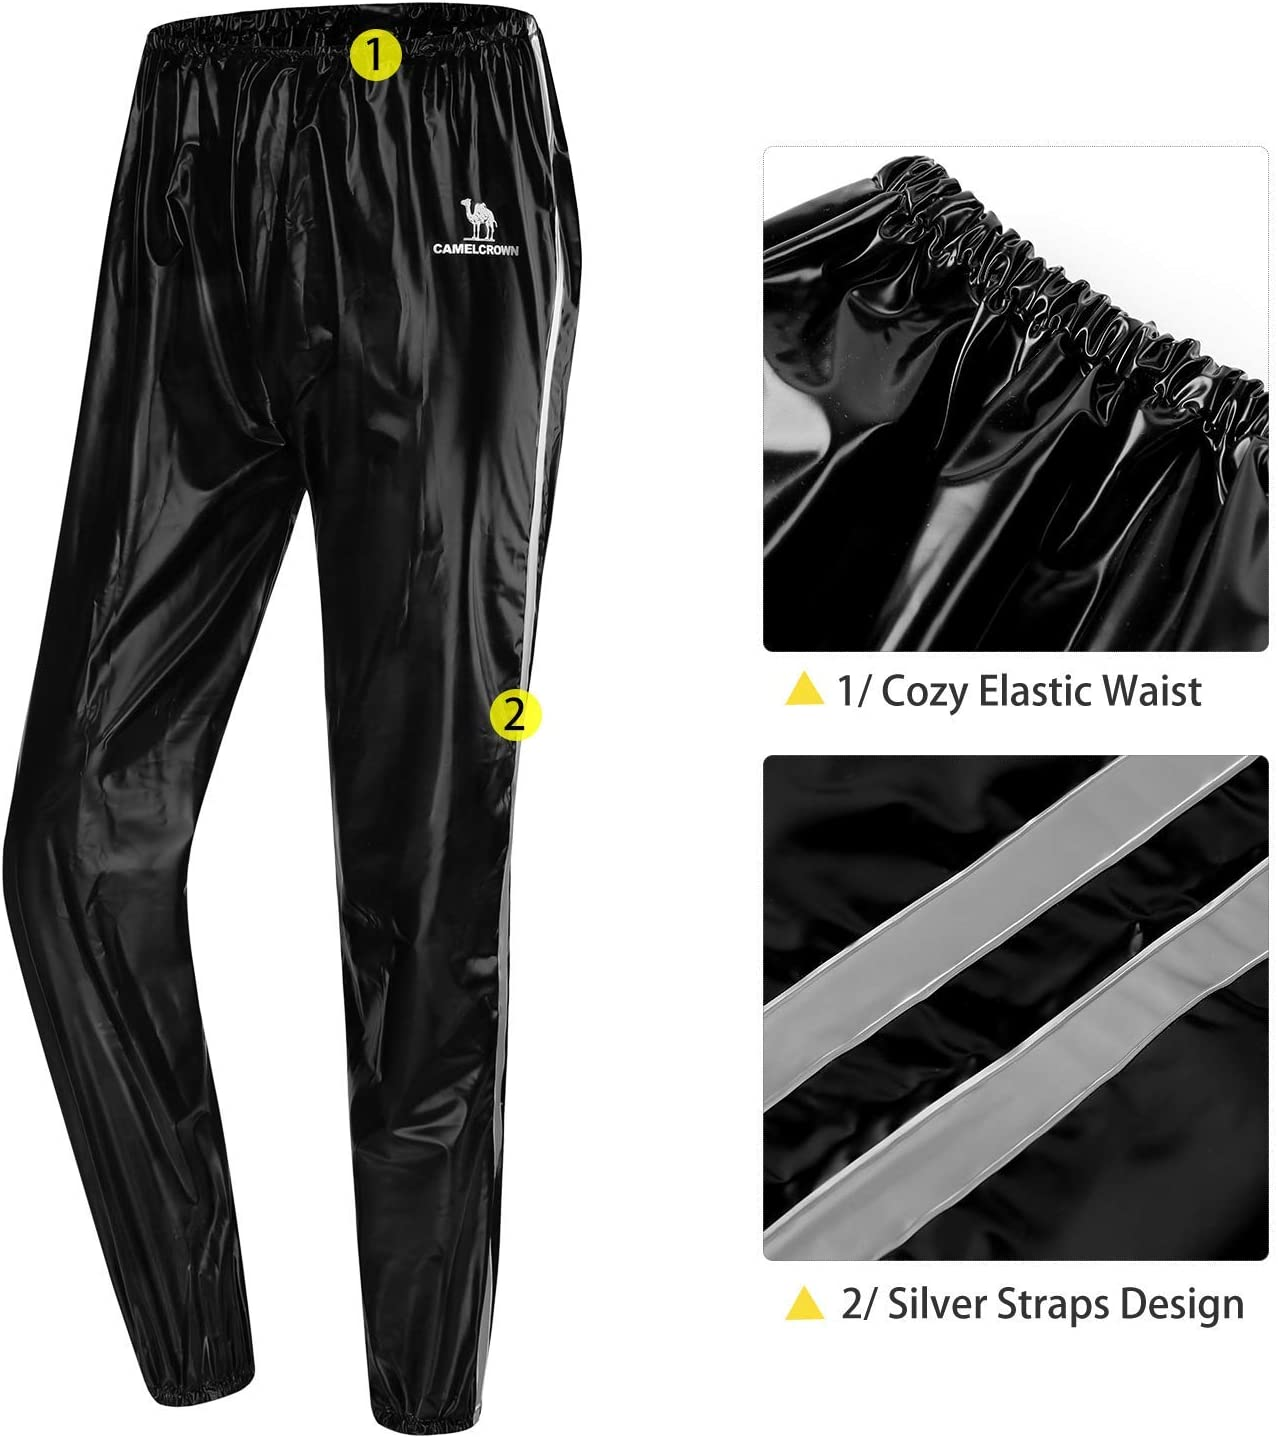 CAMEL CROWN Men/'s Sweat Suit Fitness Sauna Suit Weight Loss Jacket Slimming Shirts Fat Burner Pants Waist Trainer Track Vest